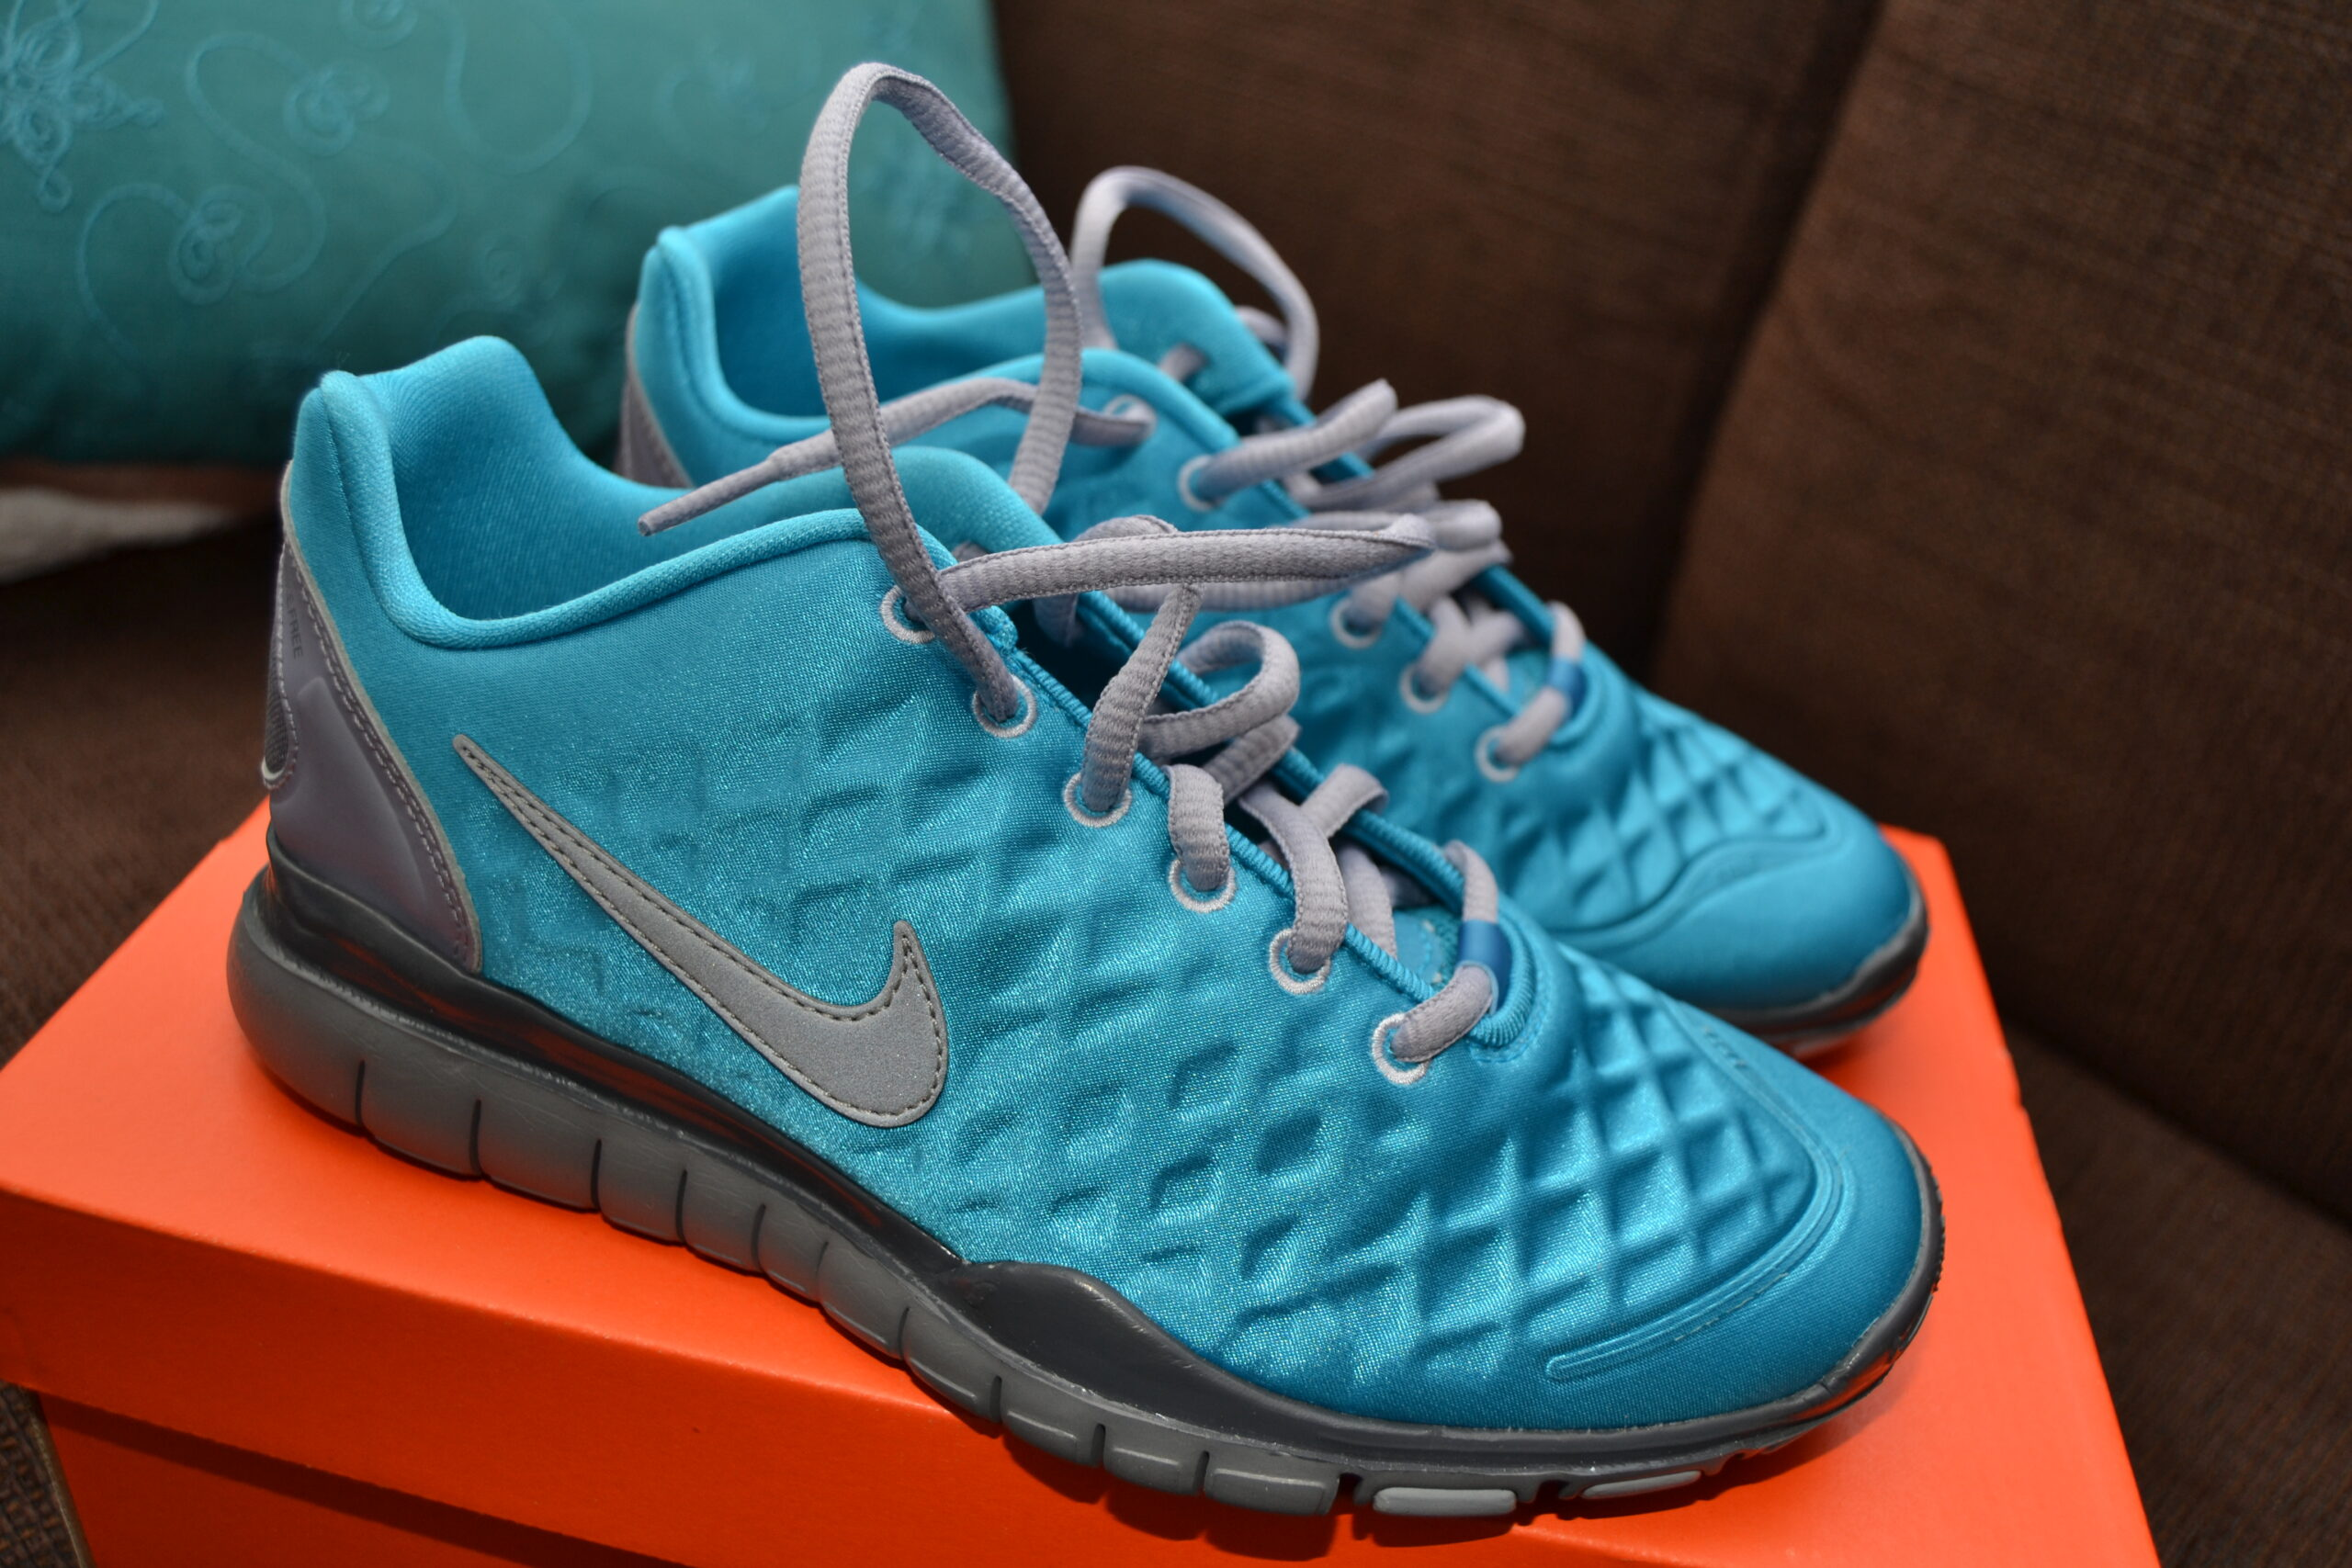 Bästa reafyndet: Nike Free Fit Winter